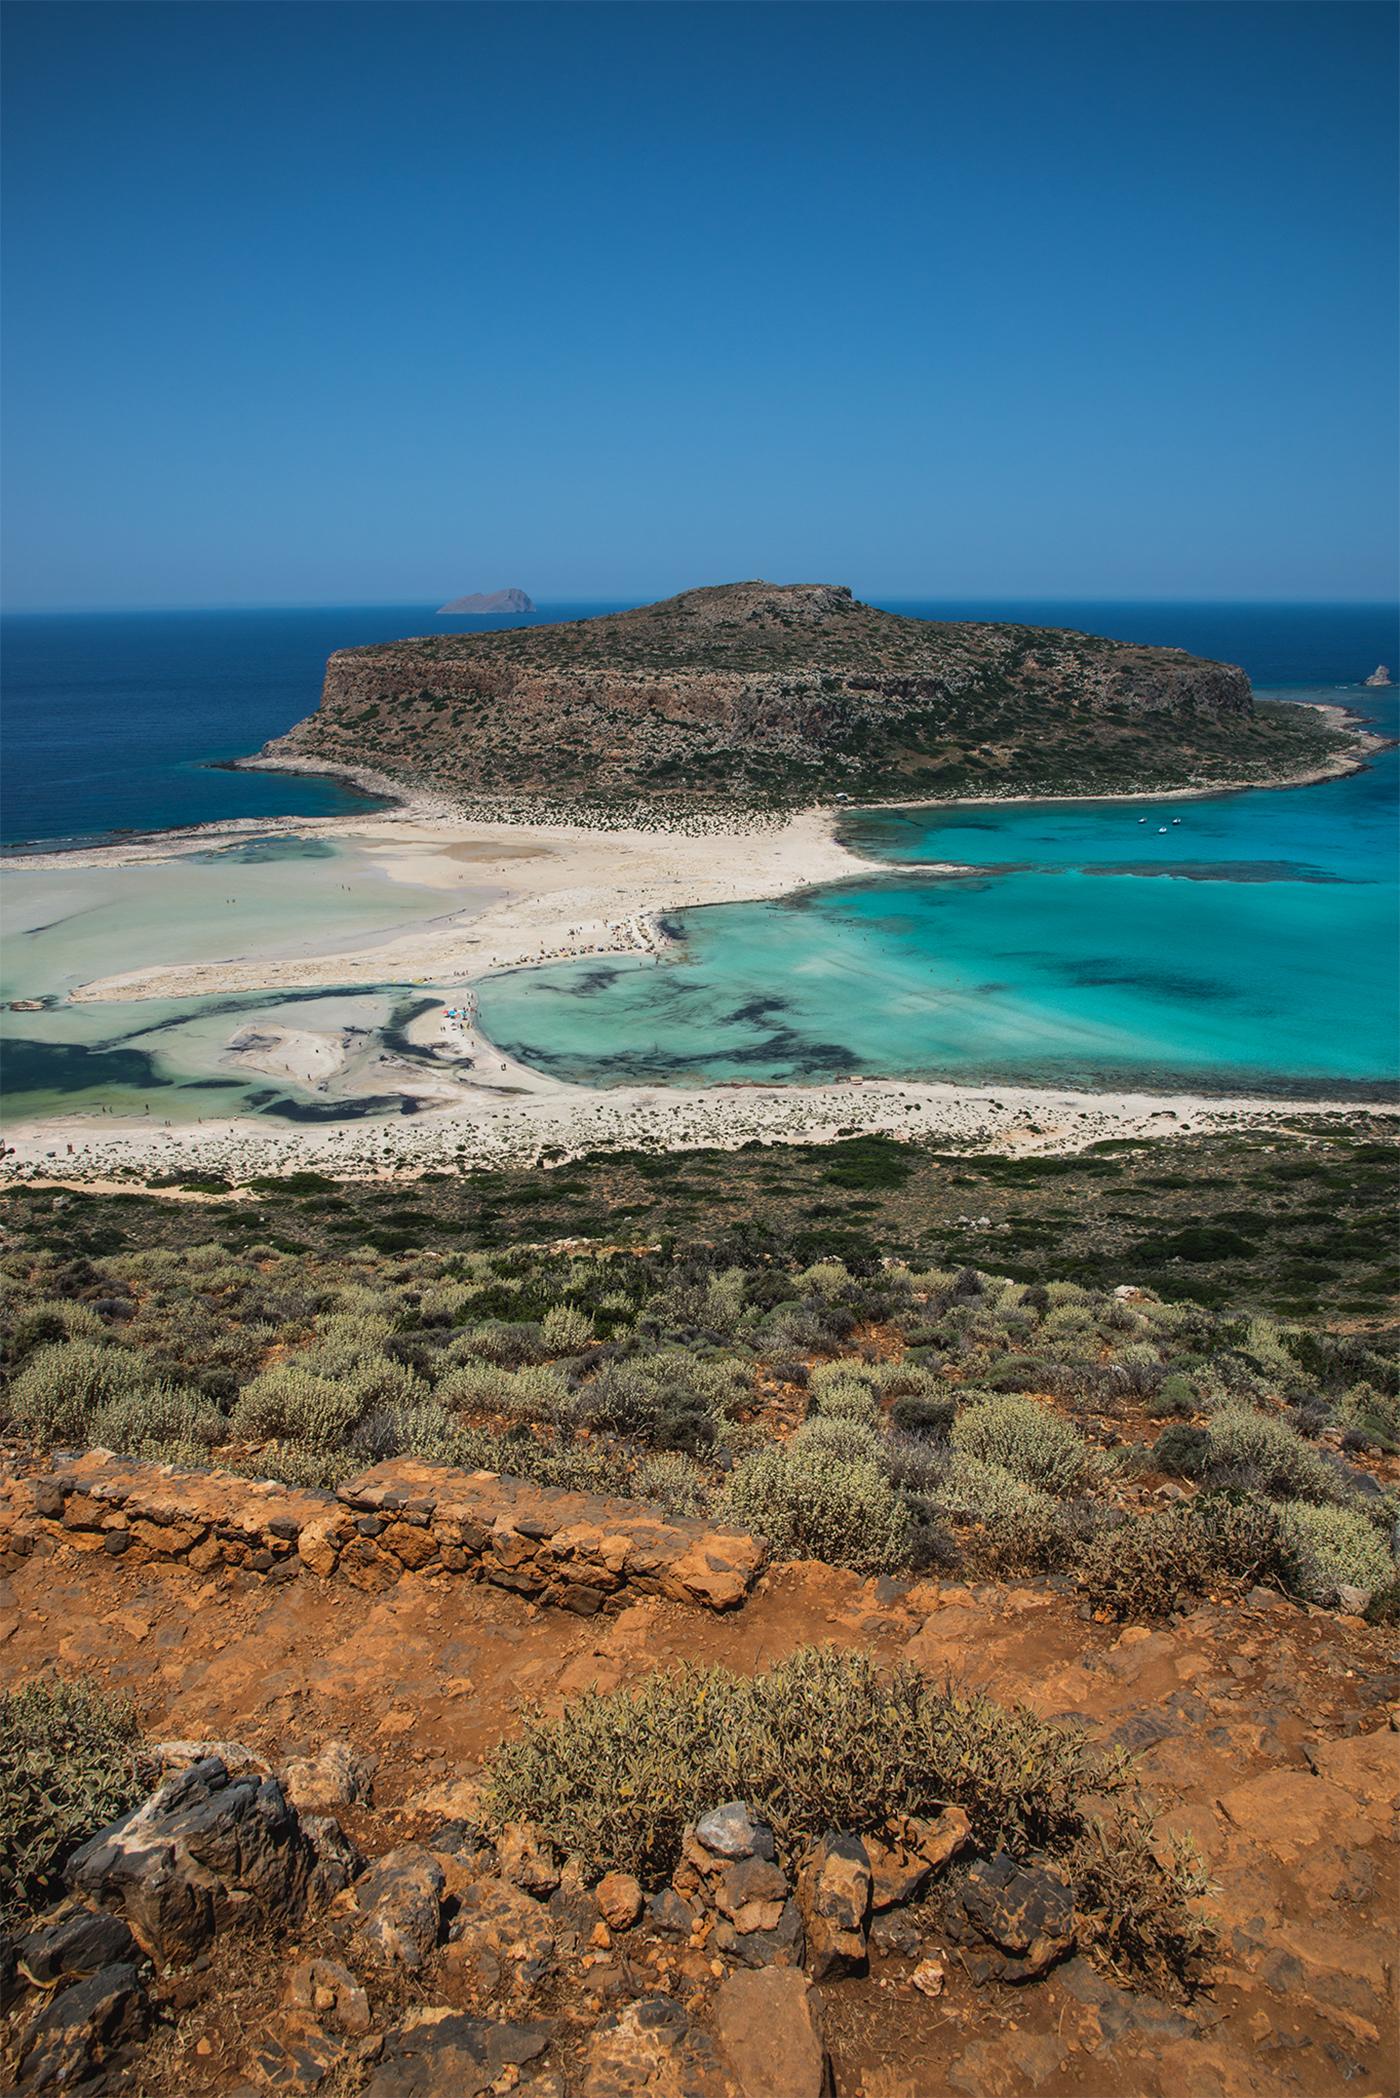 180360_BalosLagoon_Crete_